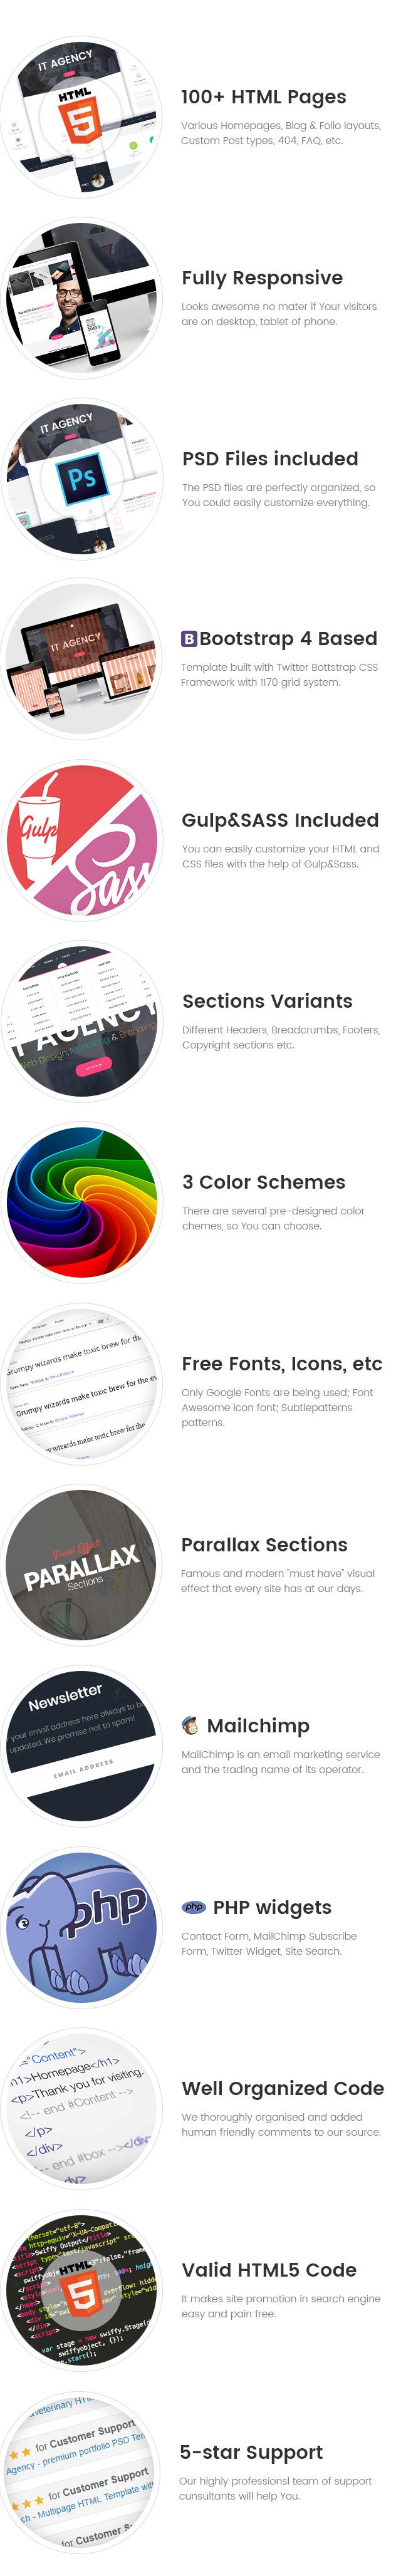 DotCreative – Web Design And Marketing Agency HTML Template